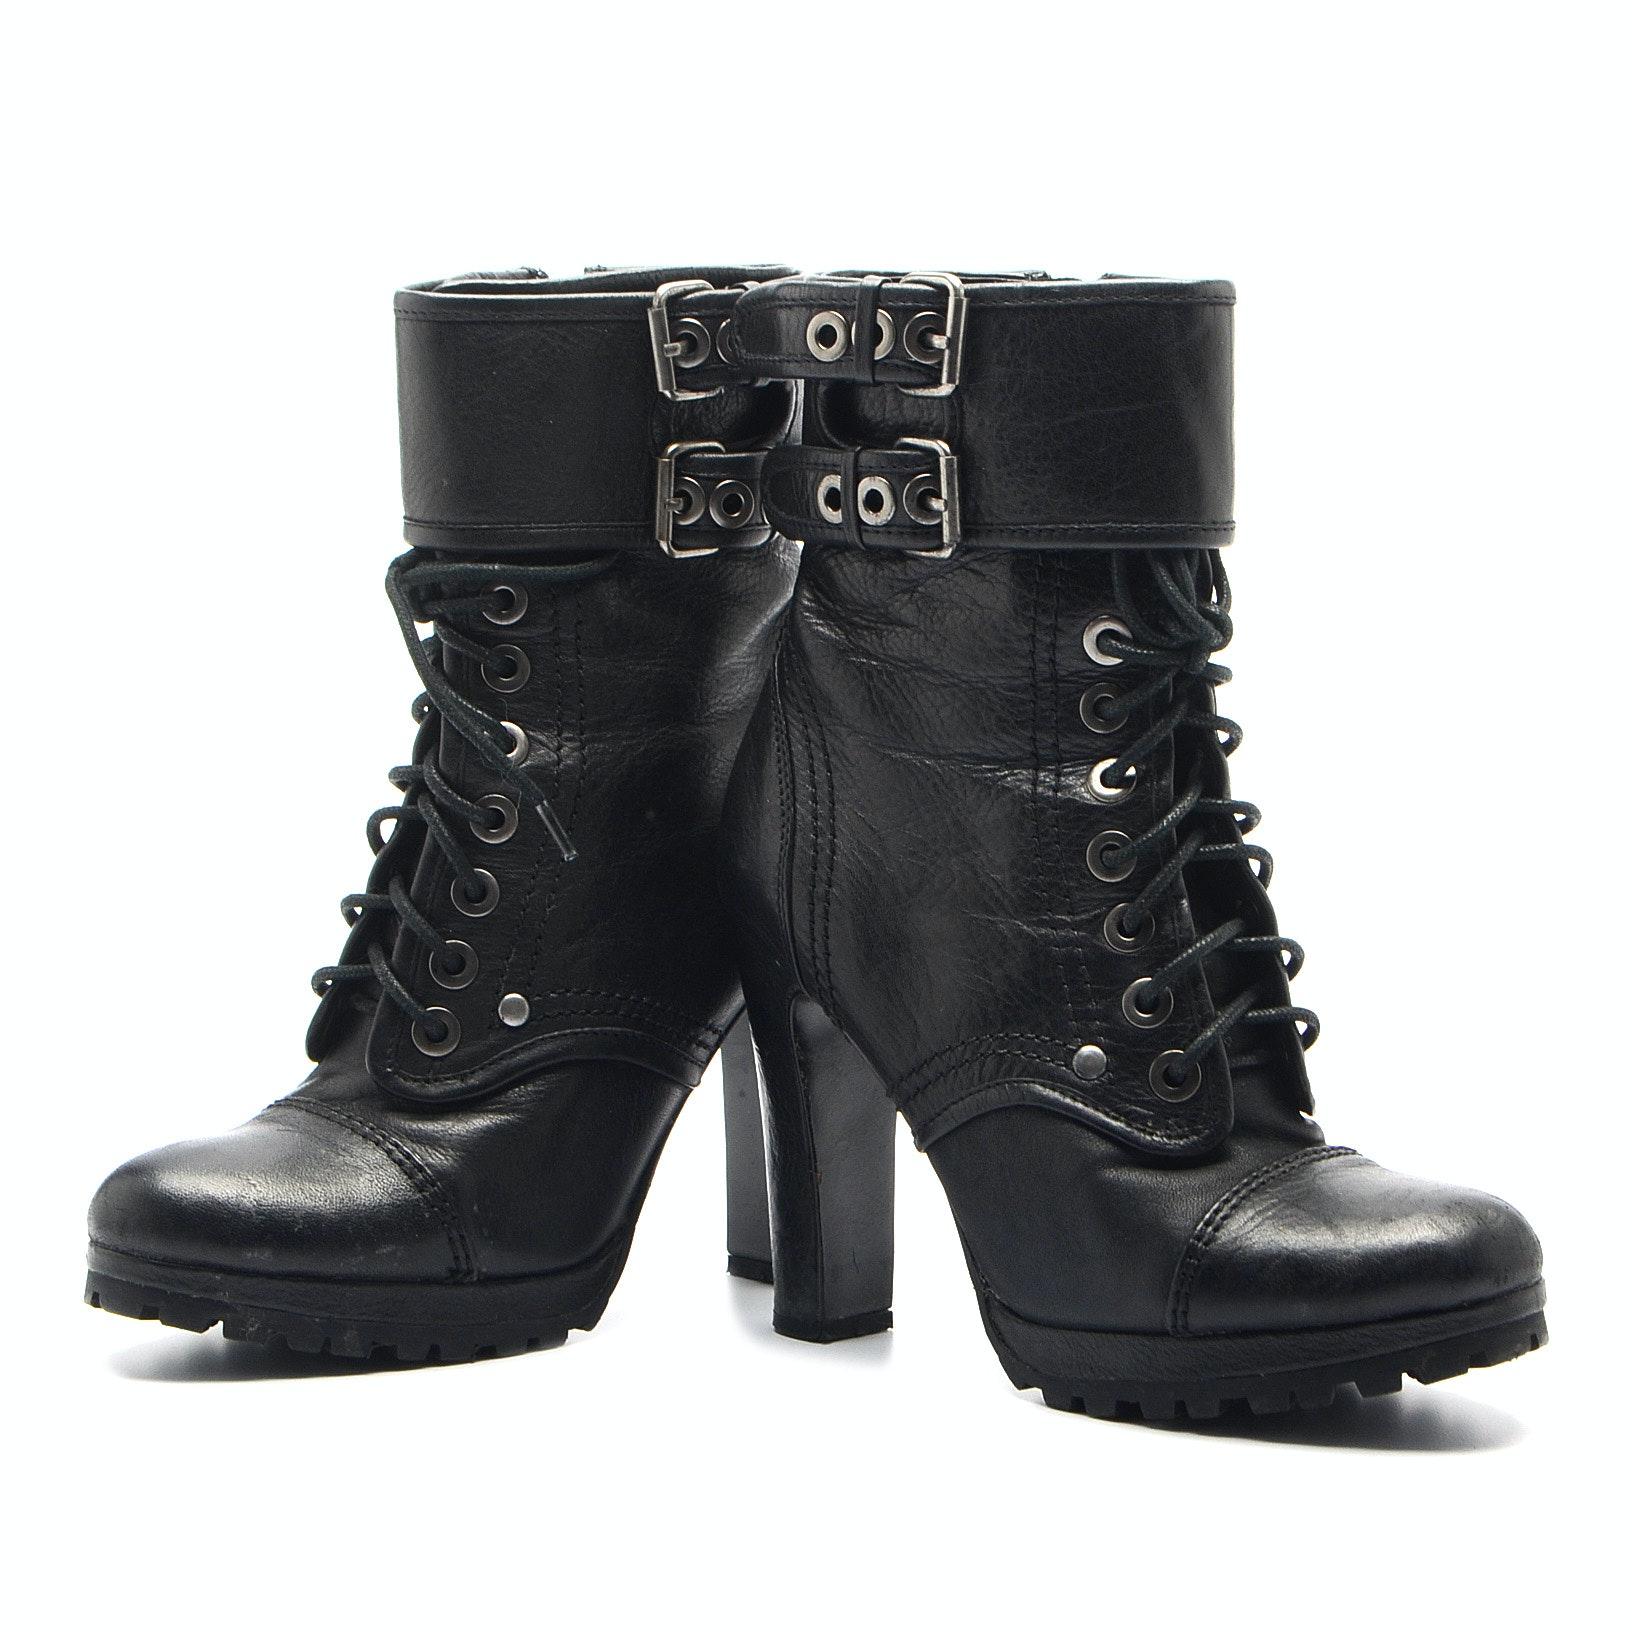 Women's Dolce Vita Joelle High Heel Boots